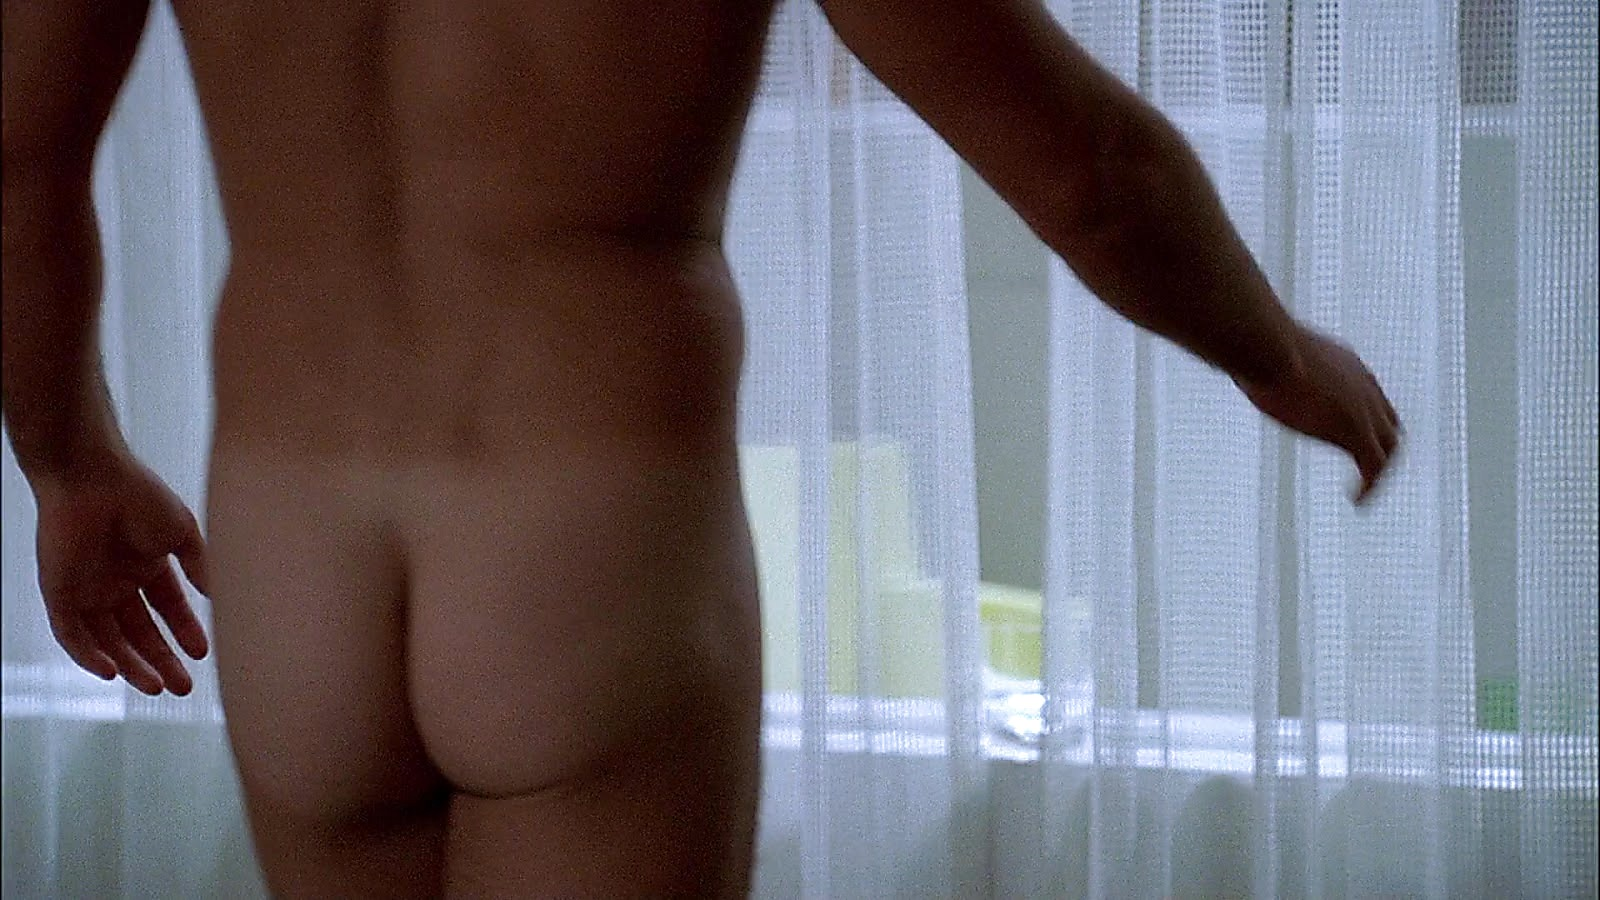 Julian Mcmahon sexy shirtless scene April 18, 2020, 1pm